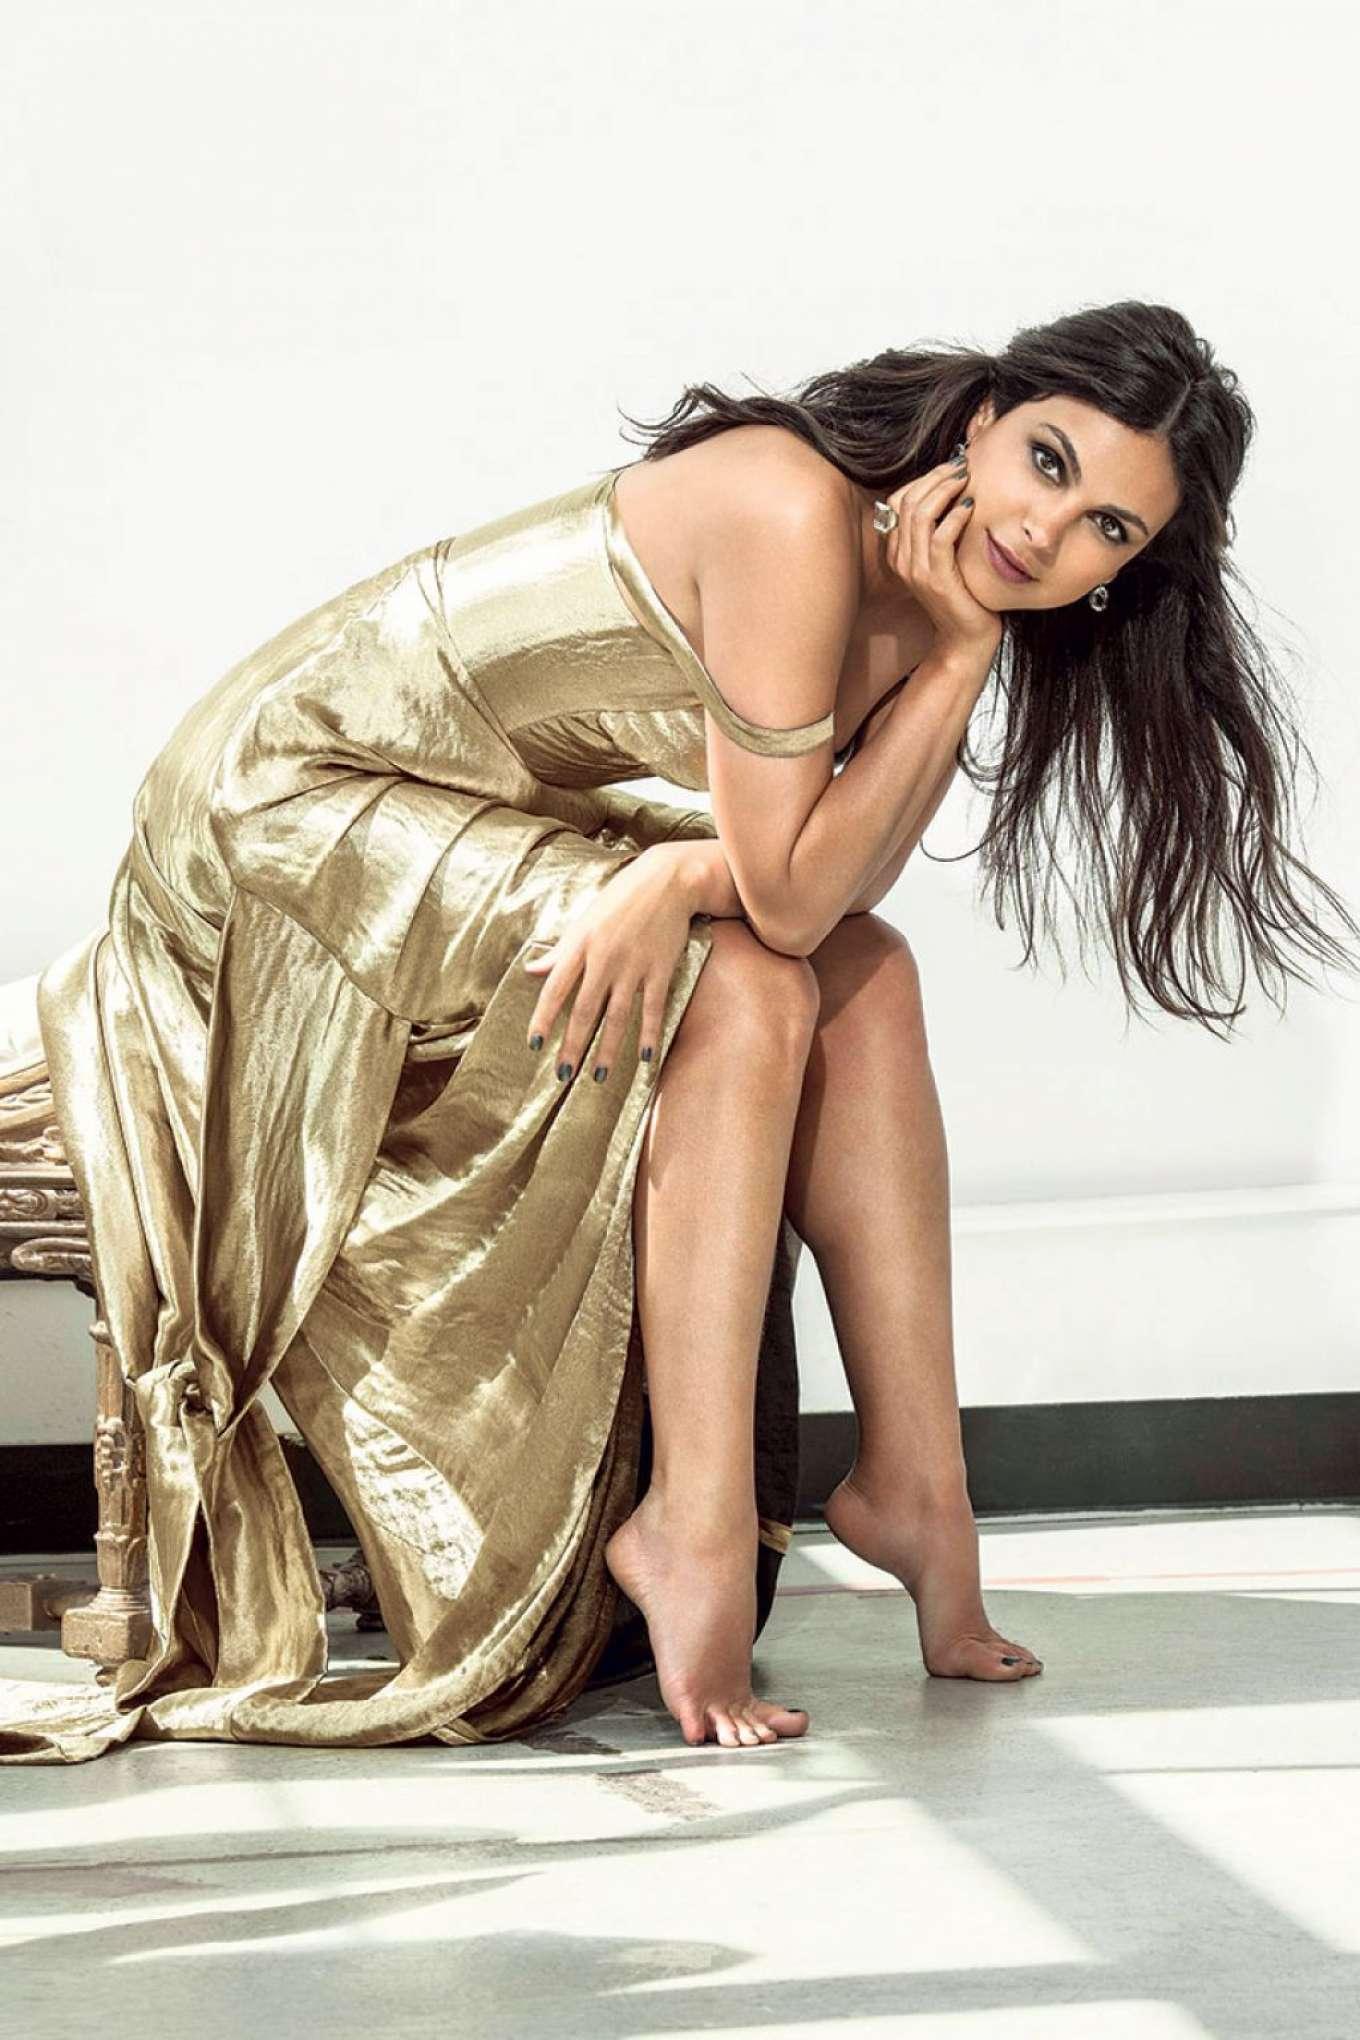 morena baccarin is a golden goddess